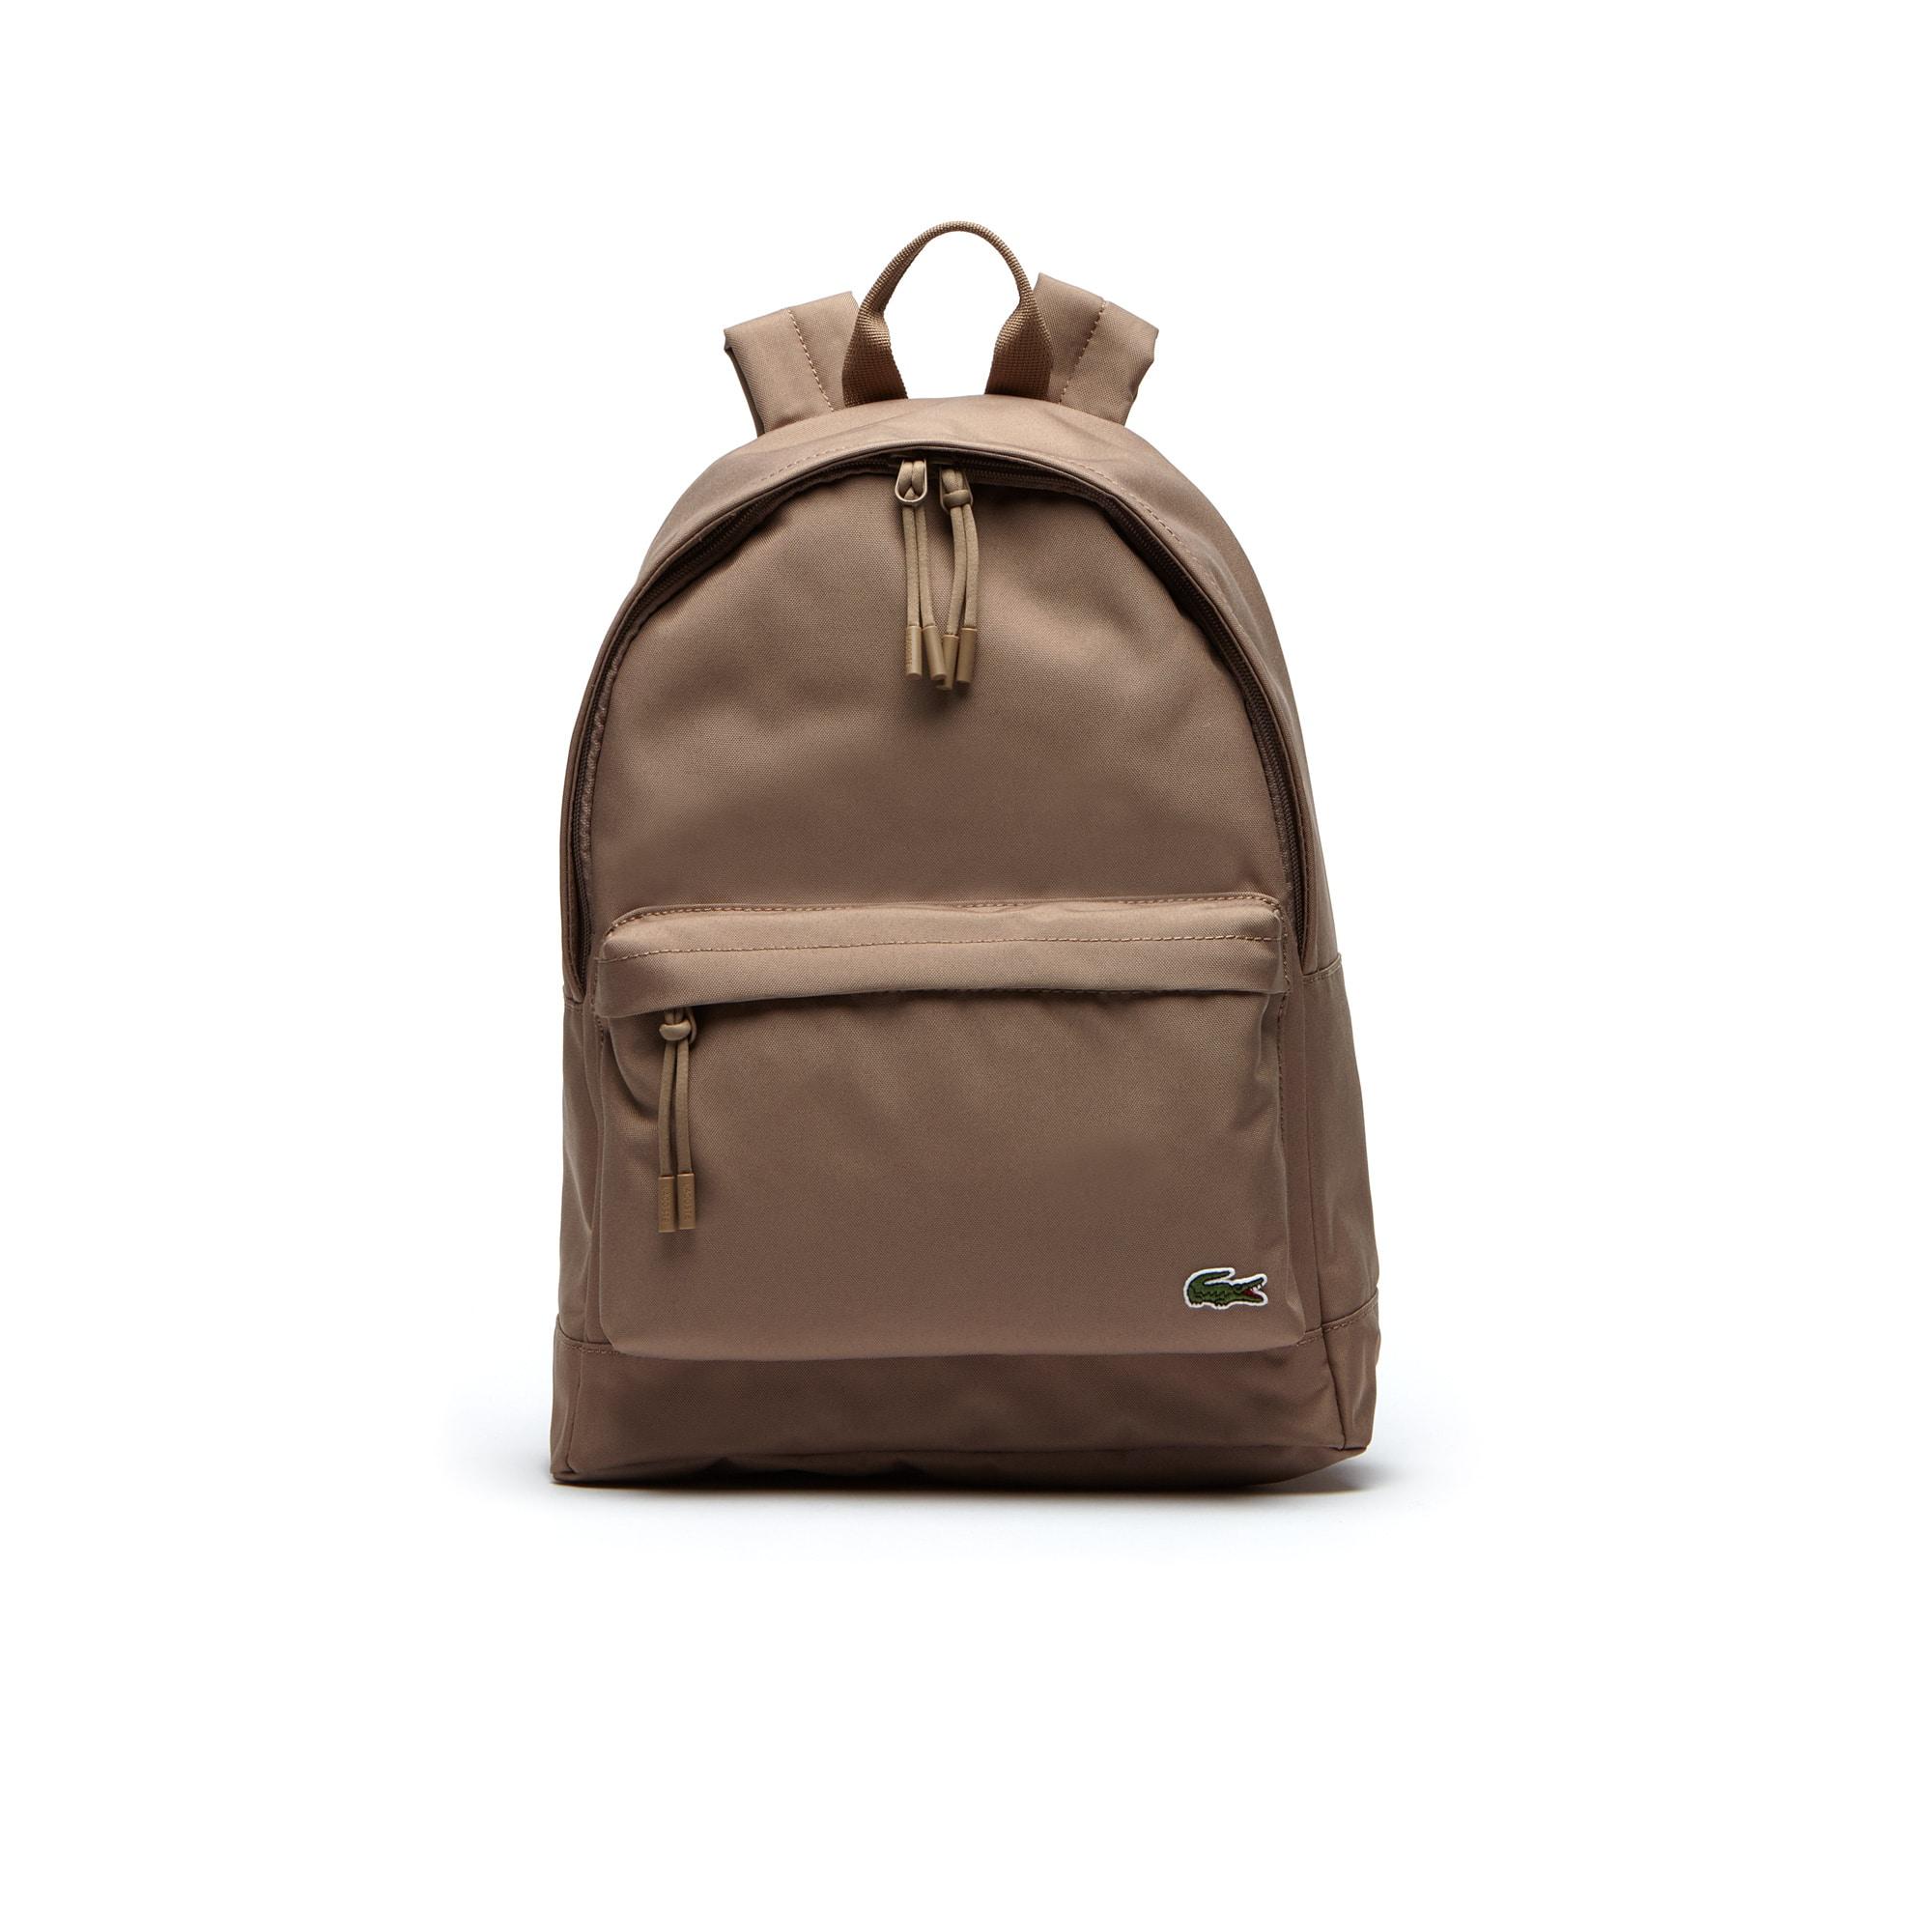 0ed18c9768 Leather Goods | Sale Men | LACOSTE